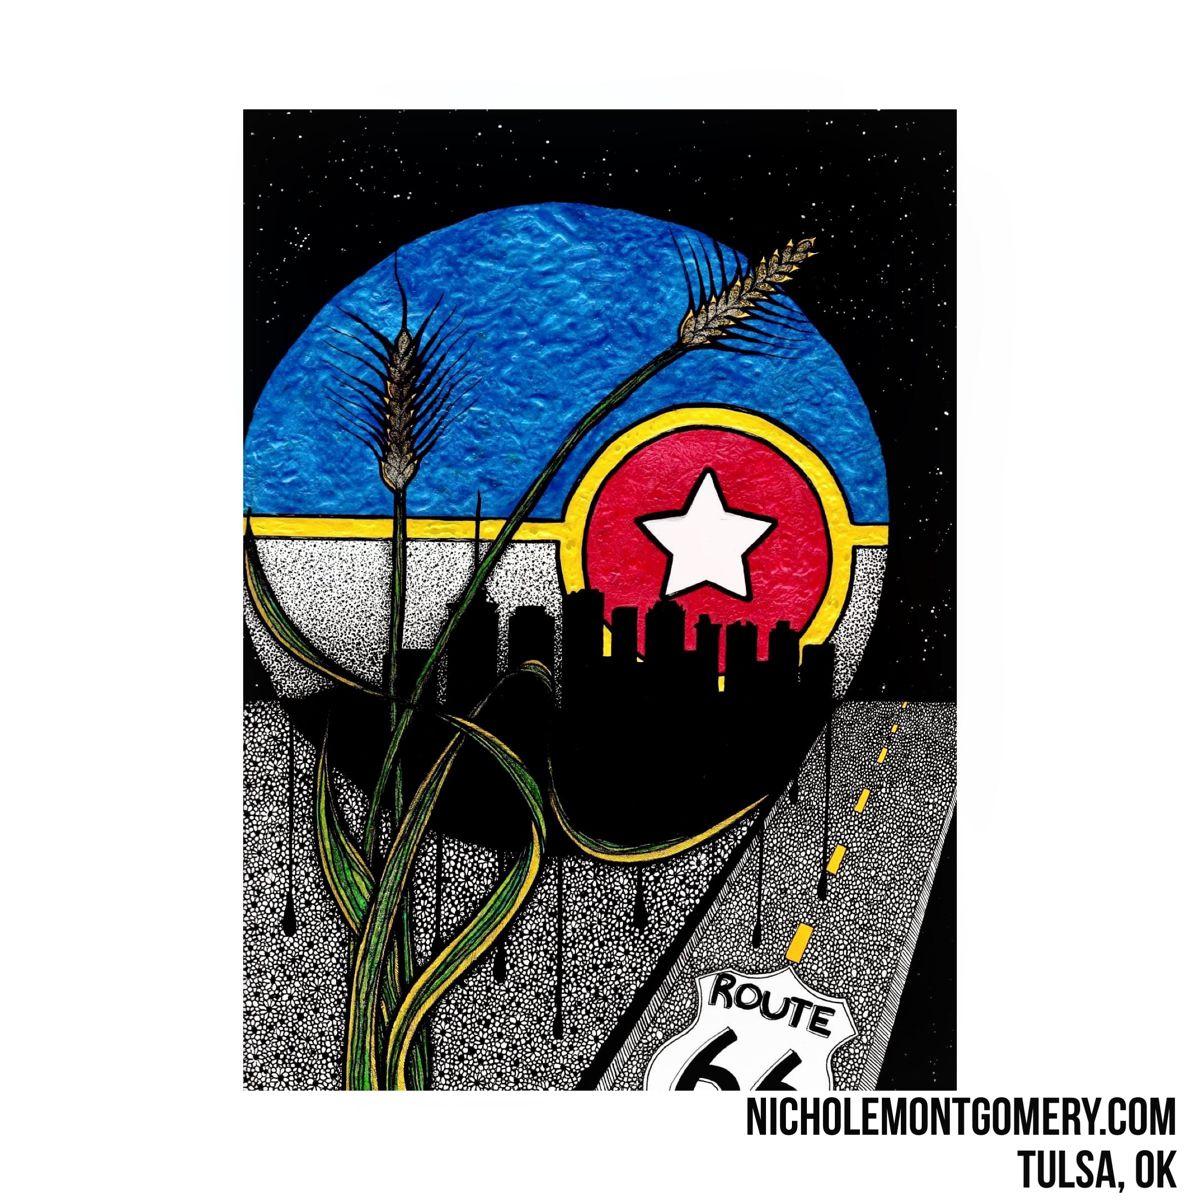 NicholeMontgomery.com • Artist: Nichole Montgomery Tulsa, OK  #tulsaartist #Oklahomaartist #NicholeMontgomery #artist #art  #drawing #artwork #painting #illustration #ink  #penandink #inkdrawing #inked #zentangle #art #tulsaart #citylife #oklahomaart #doodle #oklahoma #dots #oddart #floral #wheat #cityoftulsa #tulsaflag #city #route66 #harvest